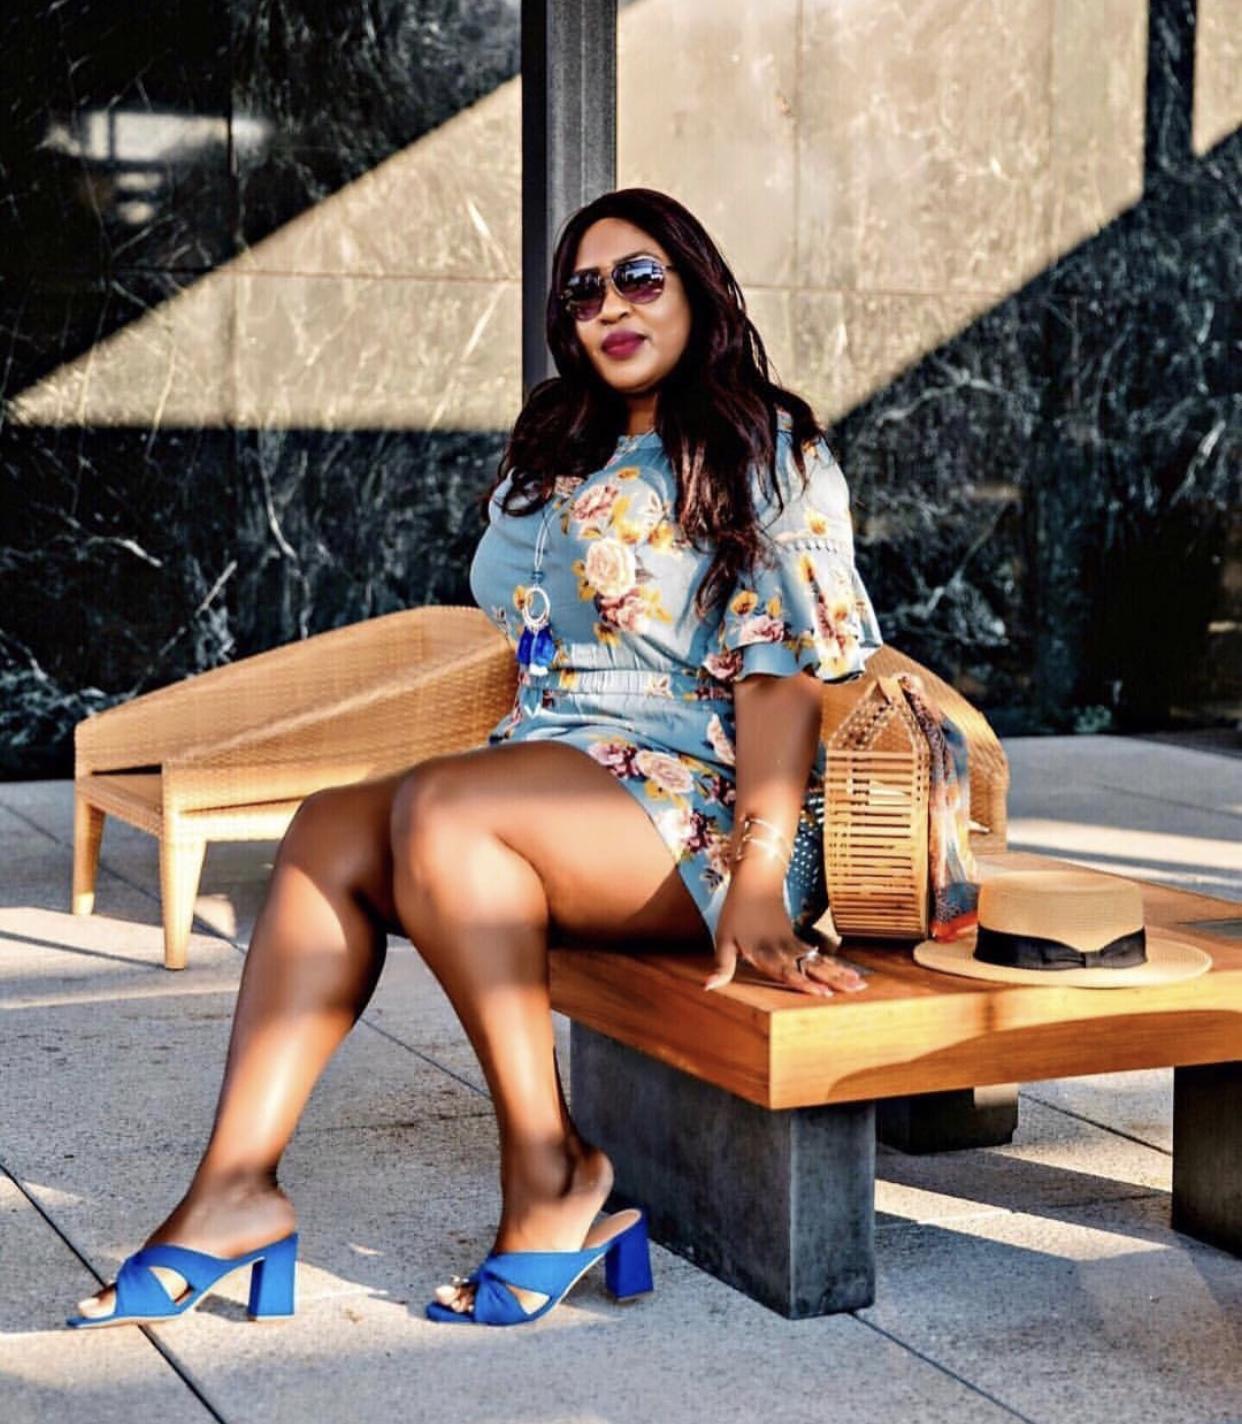 Fashion-lifestyle-inspiration-blogger-hypnozglam